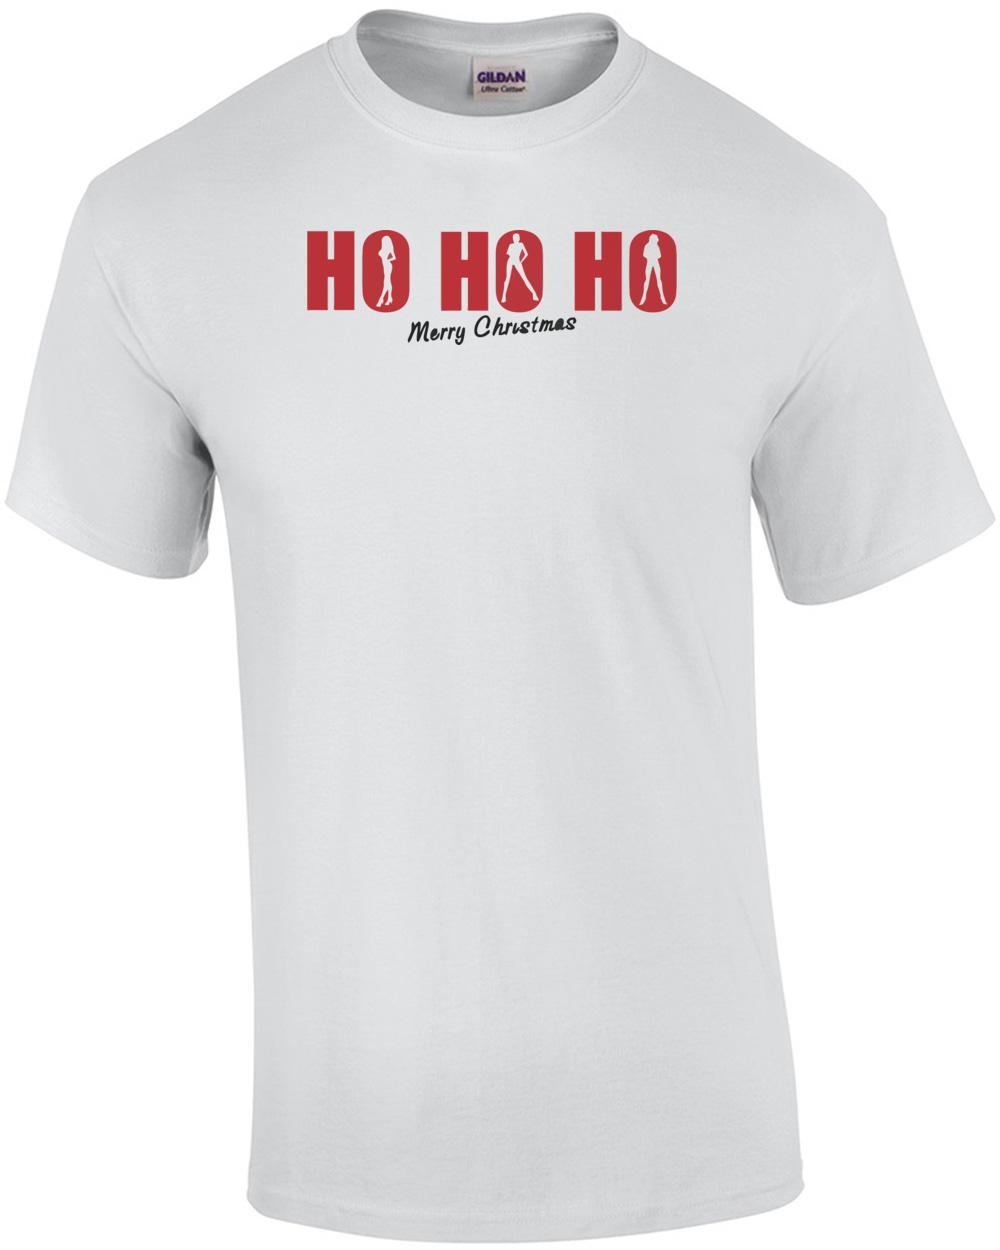 merry christmas t shirt - Funny Christmas T Shirts